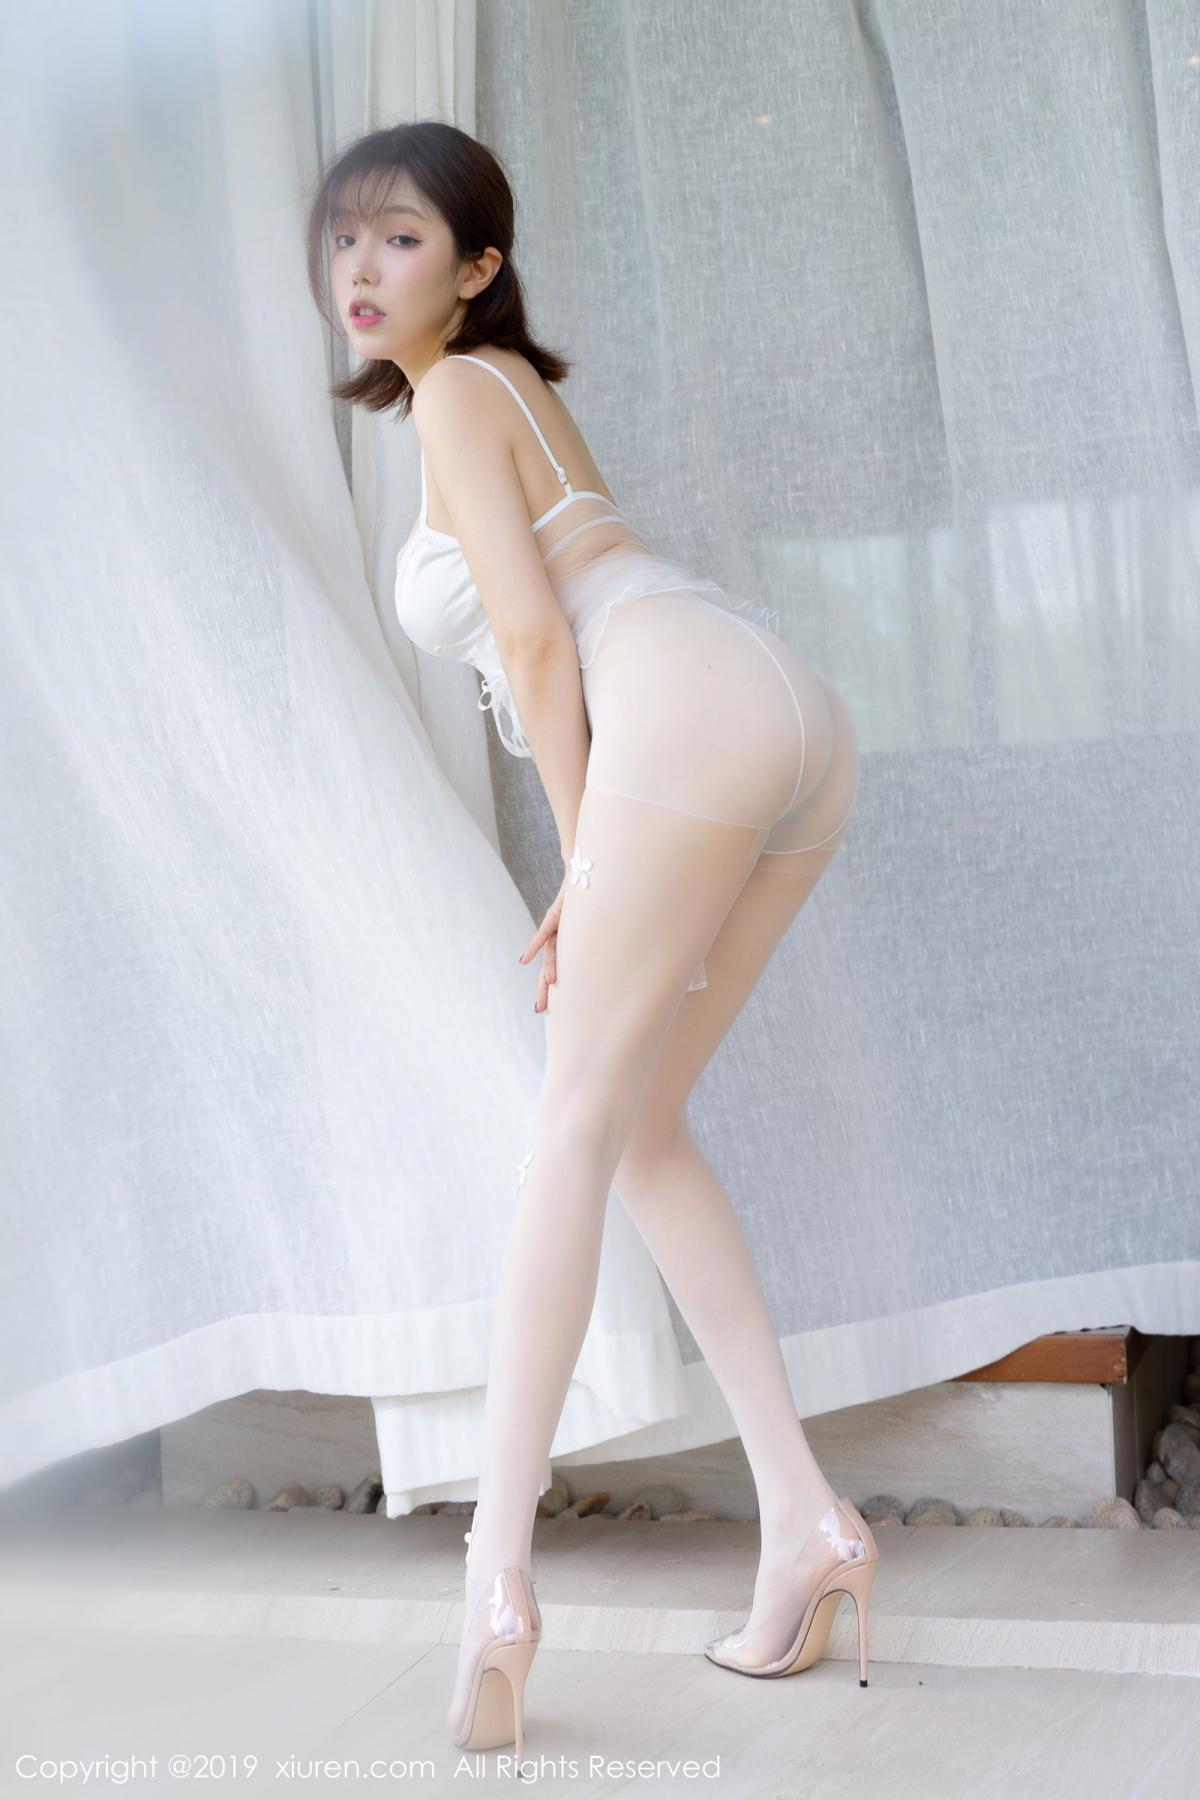 [XiuRen] Vol.1578 Huang Le Ran 32P, Huang Le Ran, Underwear, Xiuren